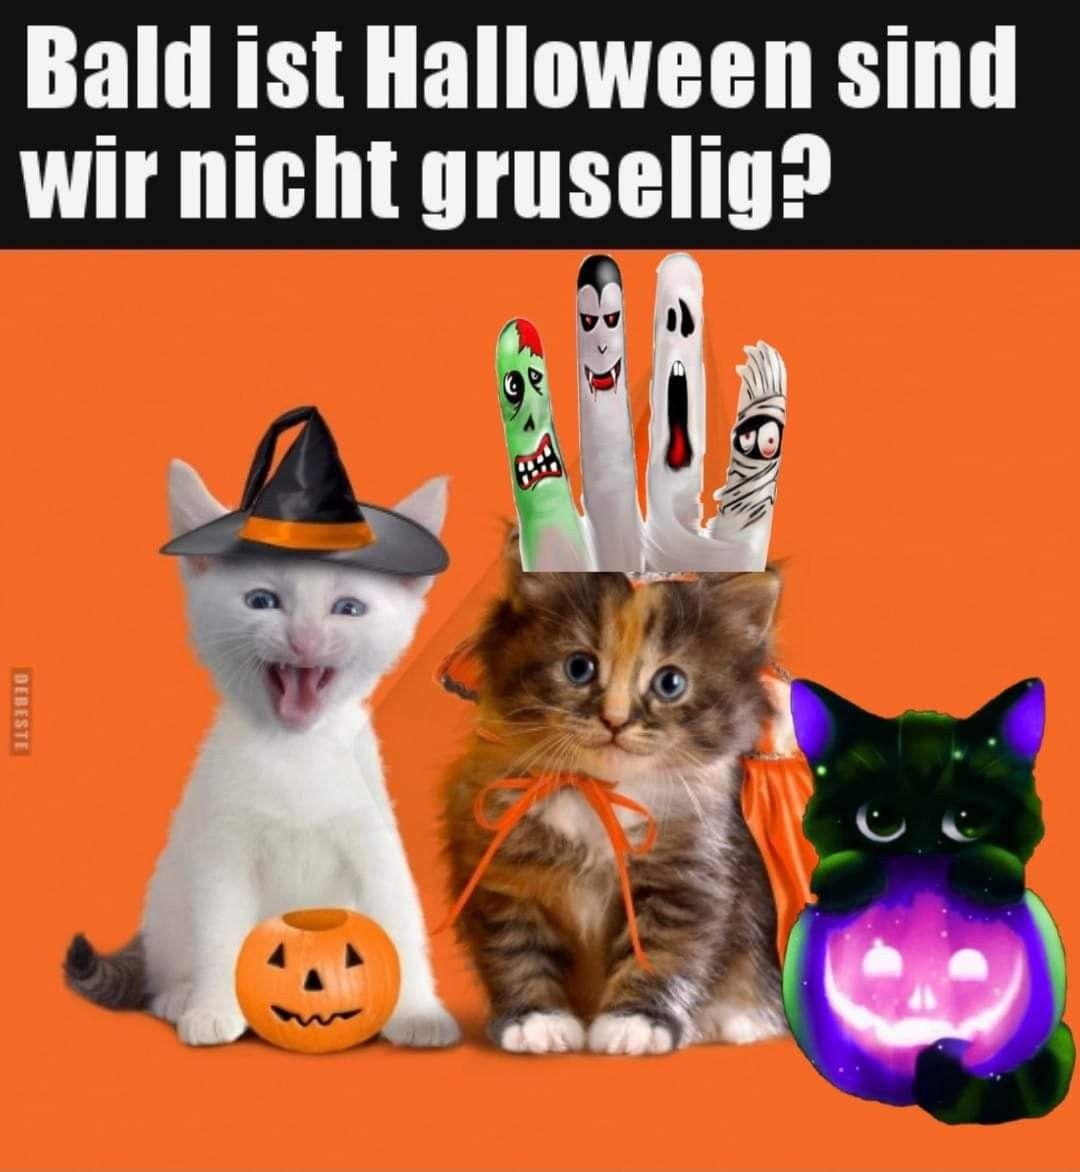 Pin Von Kerstin Wilke Auf Katzen Katze Lustig Lustig Humor Katzen